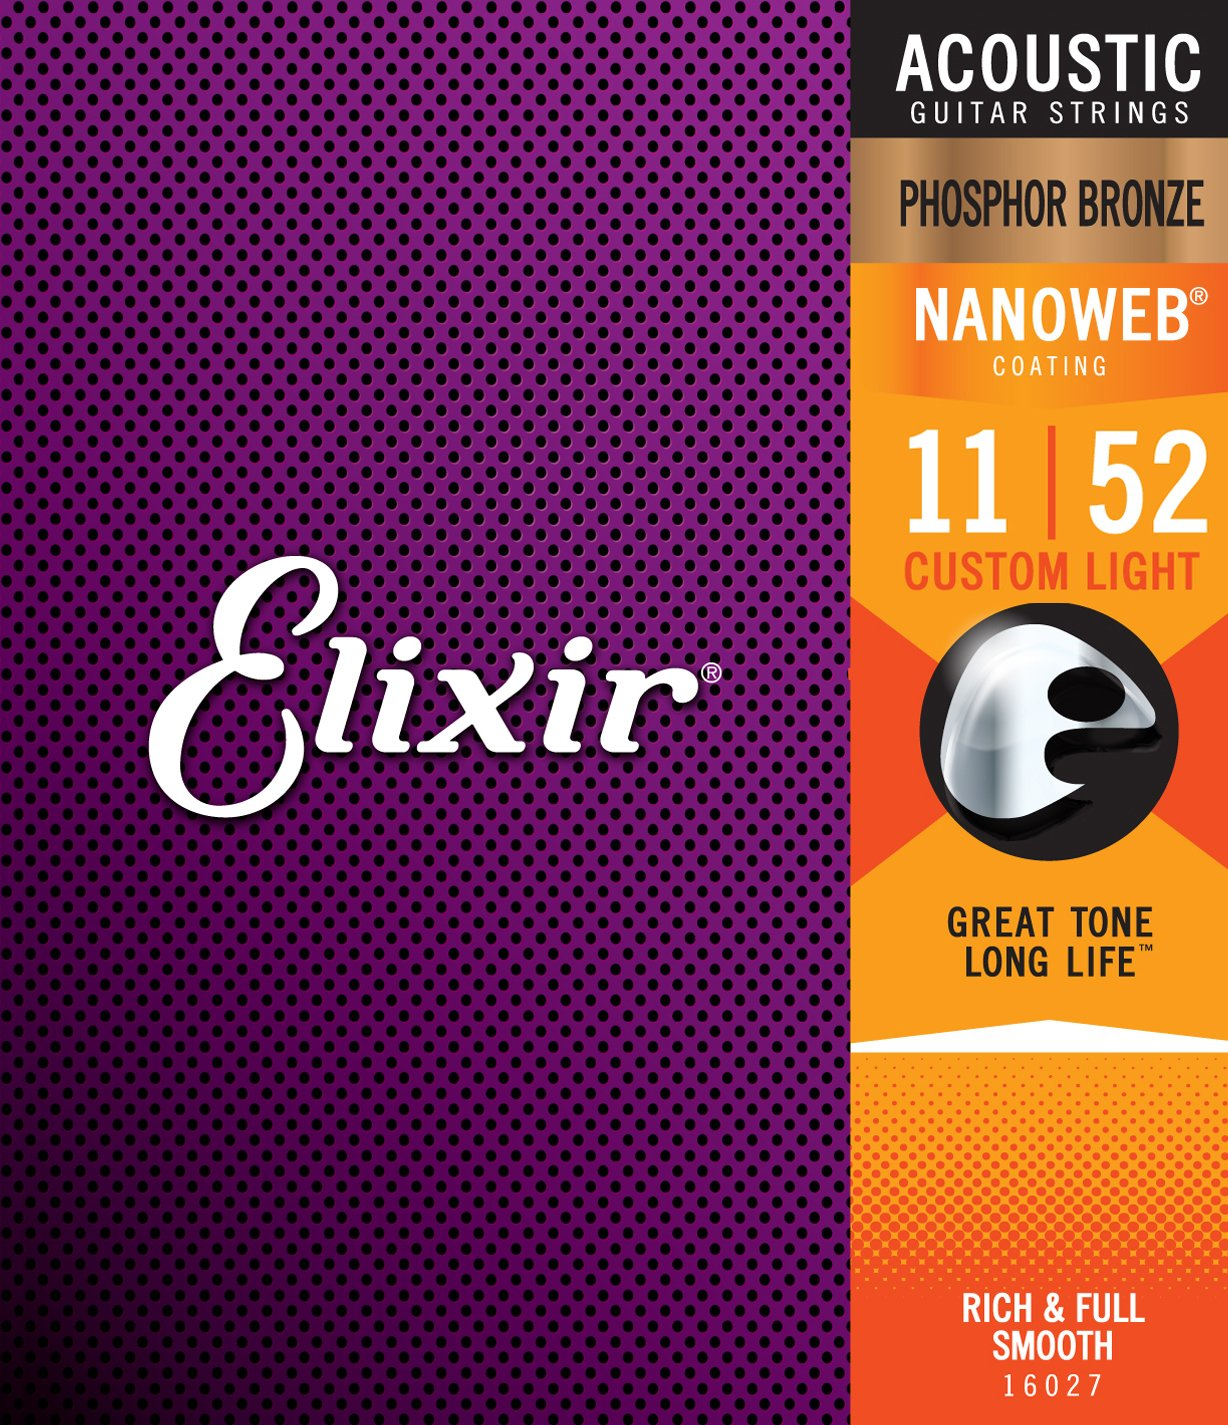 Elixir Phosphor Bronze 16027 Acoustic Guitar Strings, NANOWEB, Custom Light, 11-52